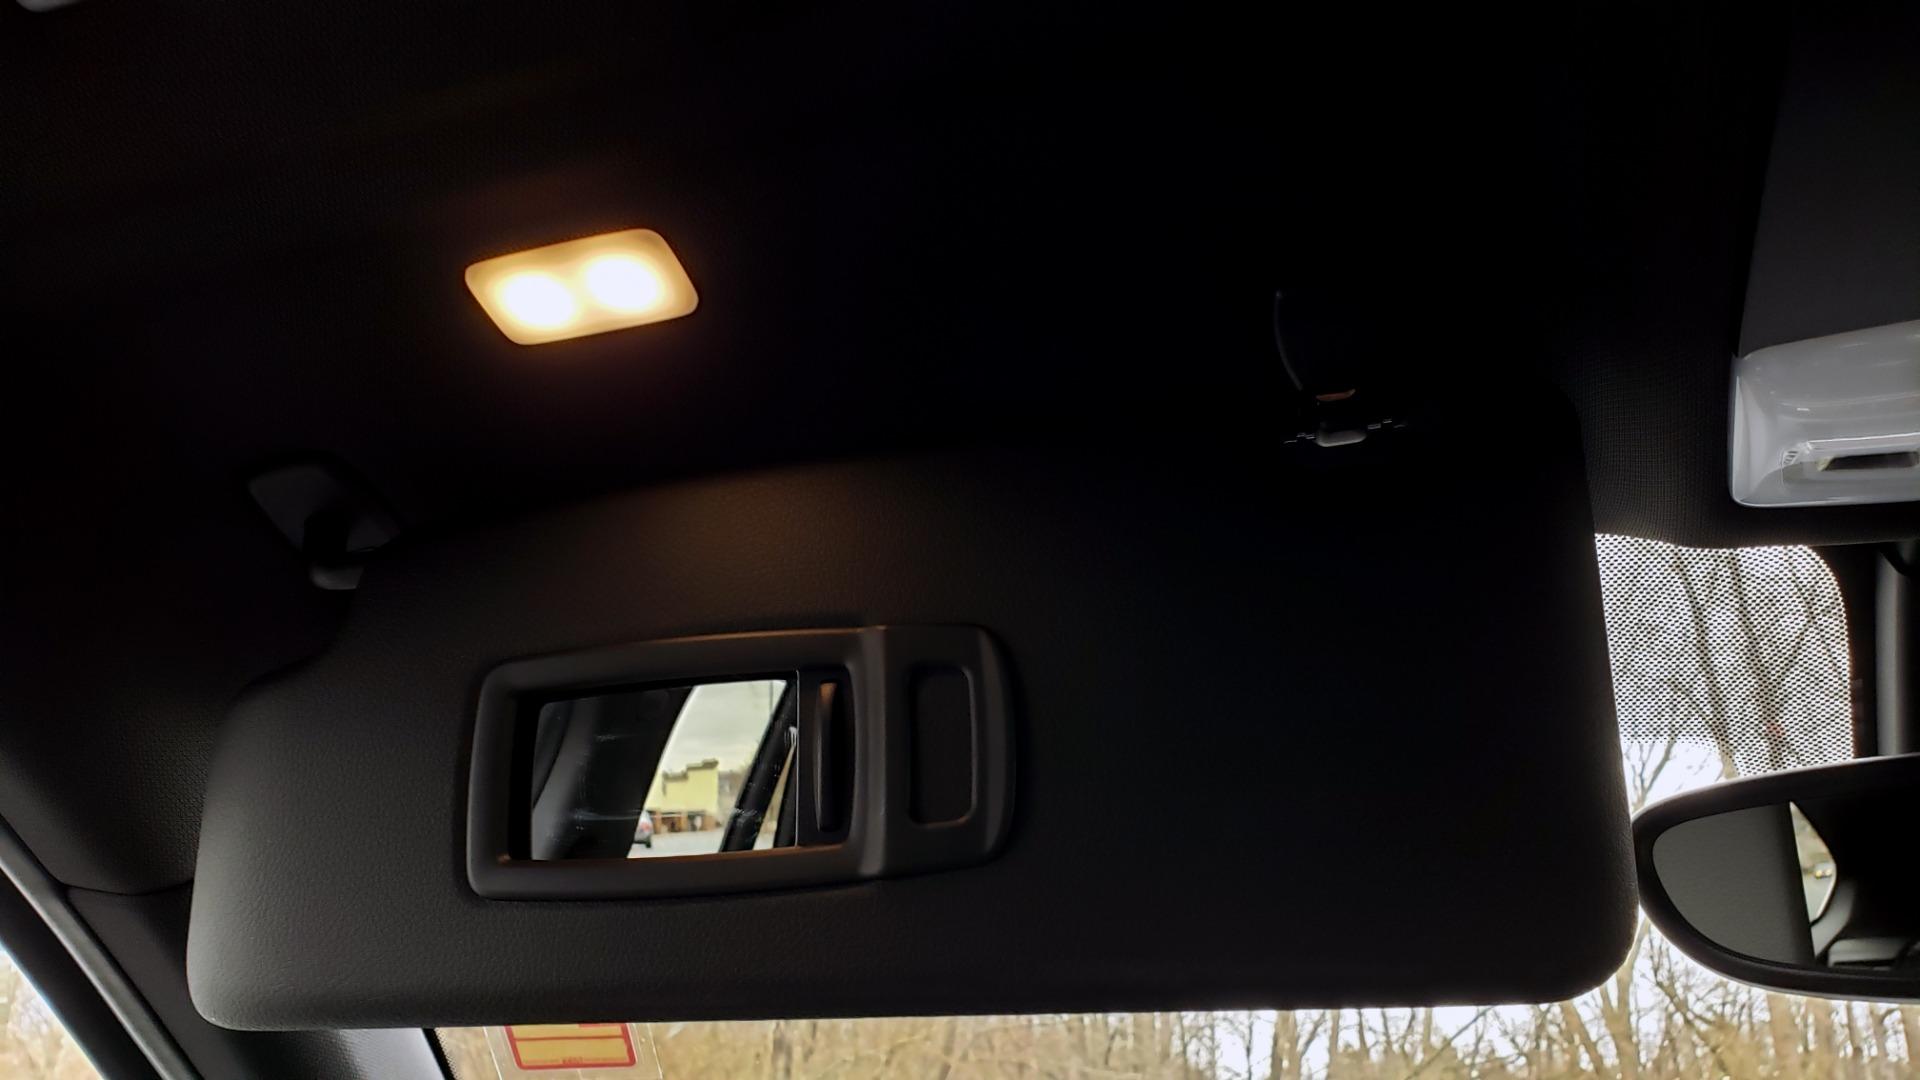 Used 2017 BMW X1 XDRIVE28I / PREM PKG / DRIVER ASST / NAV / CLD WTHR for sale Sold at Formula Imports in Charlotte NC 28227 56